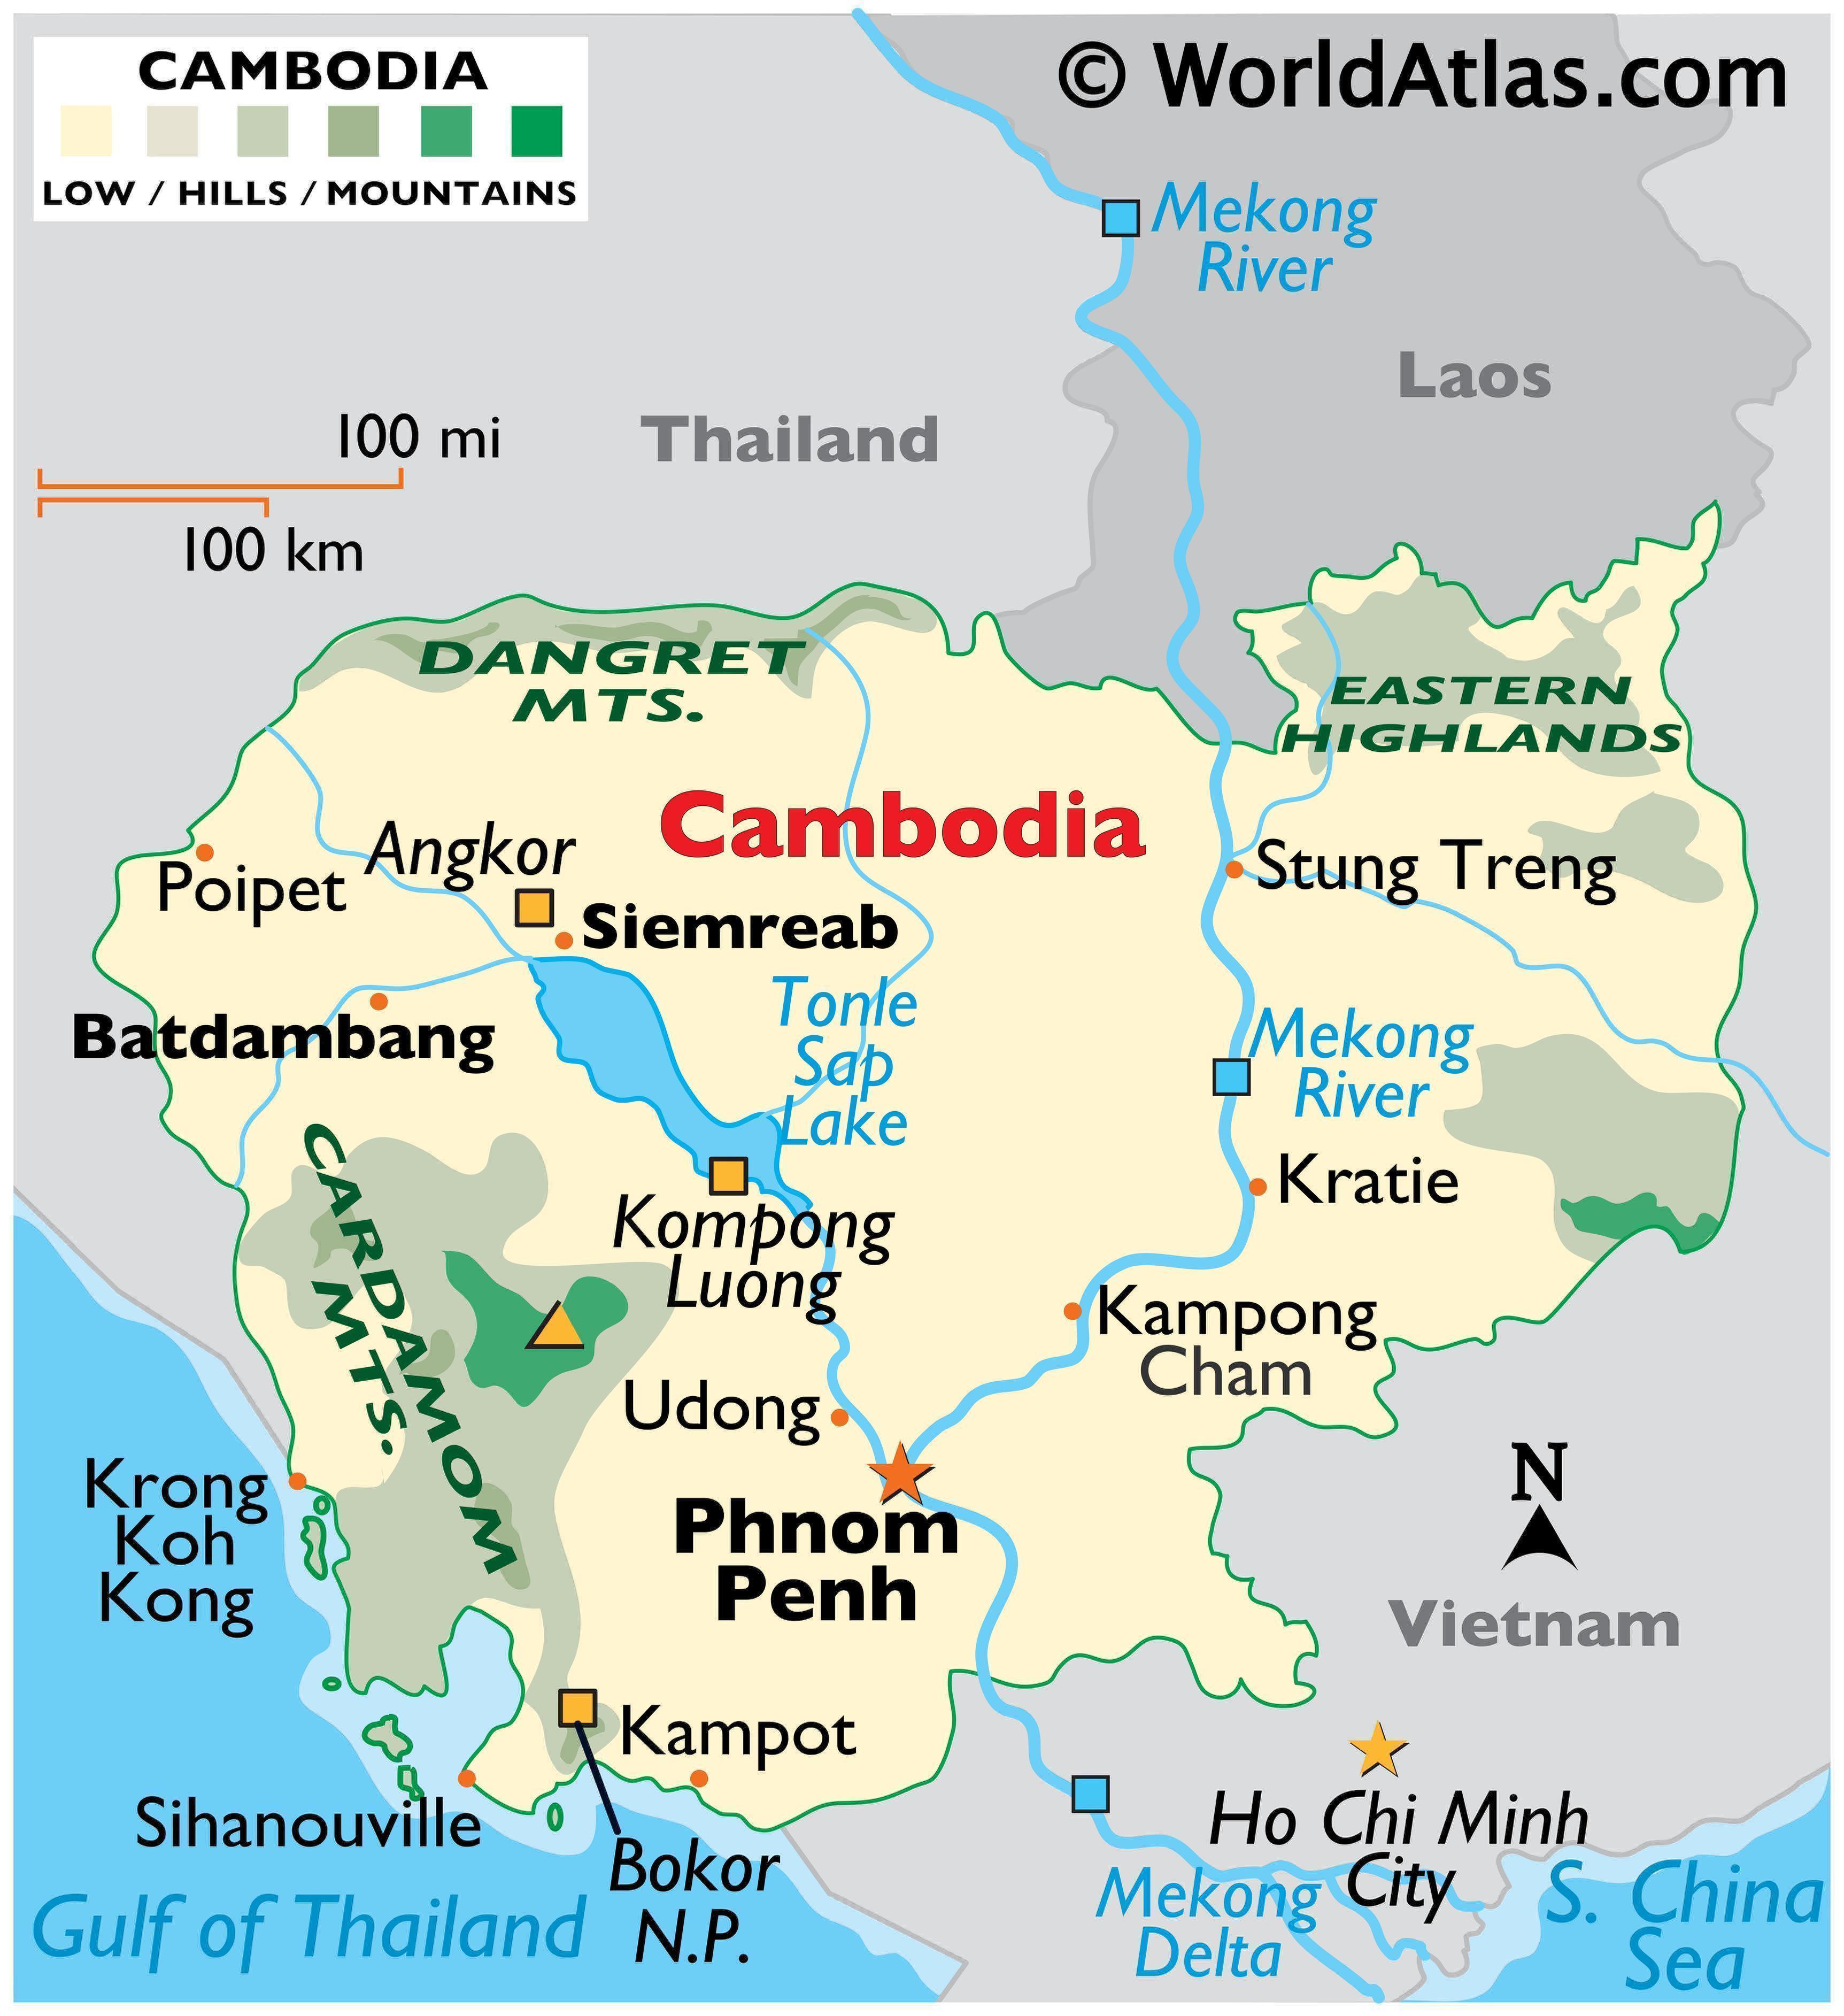 Cambodia Maps Amp Facts